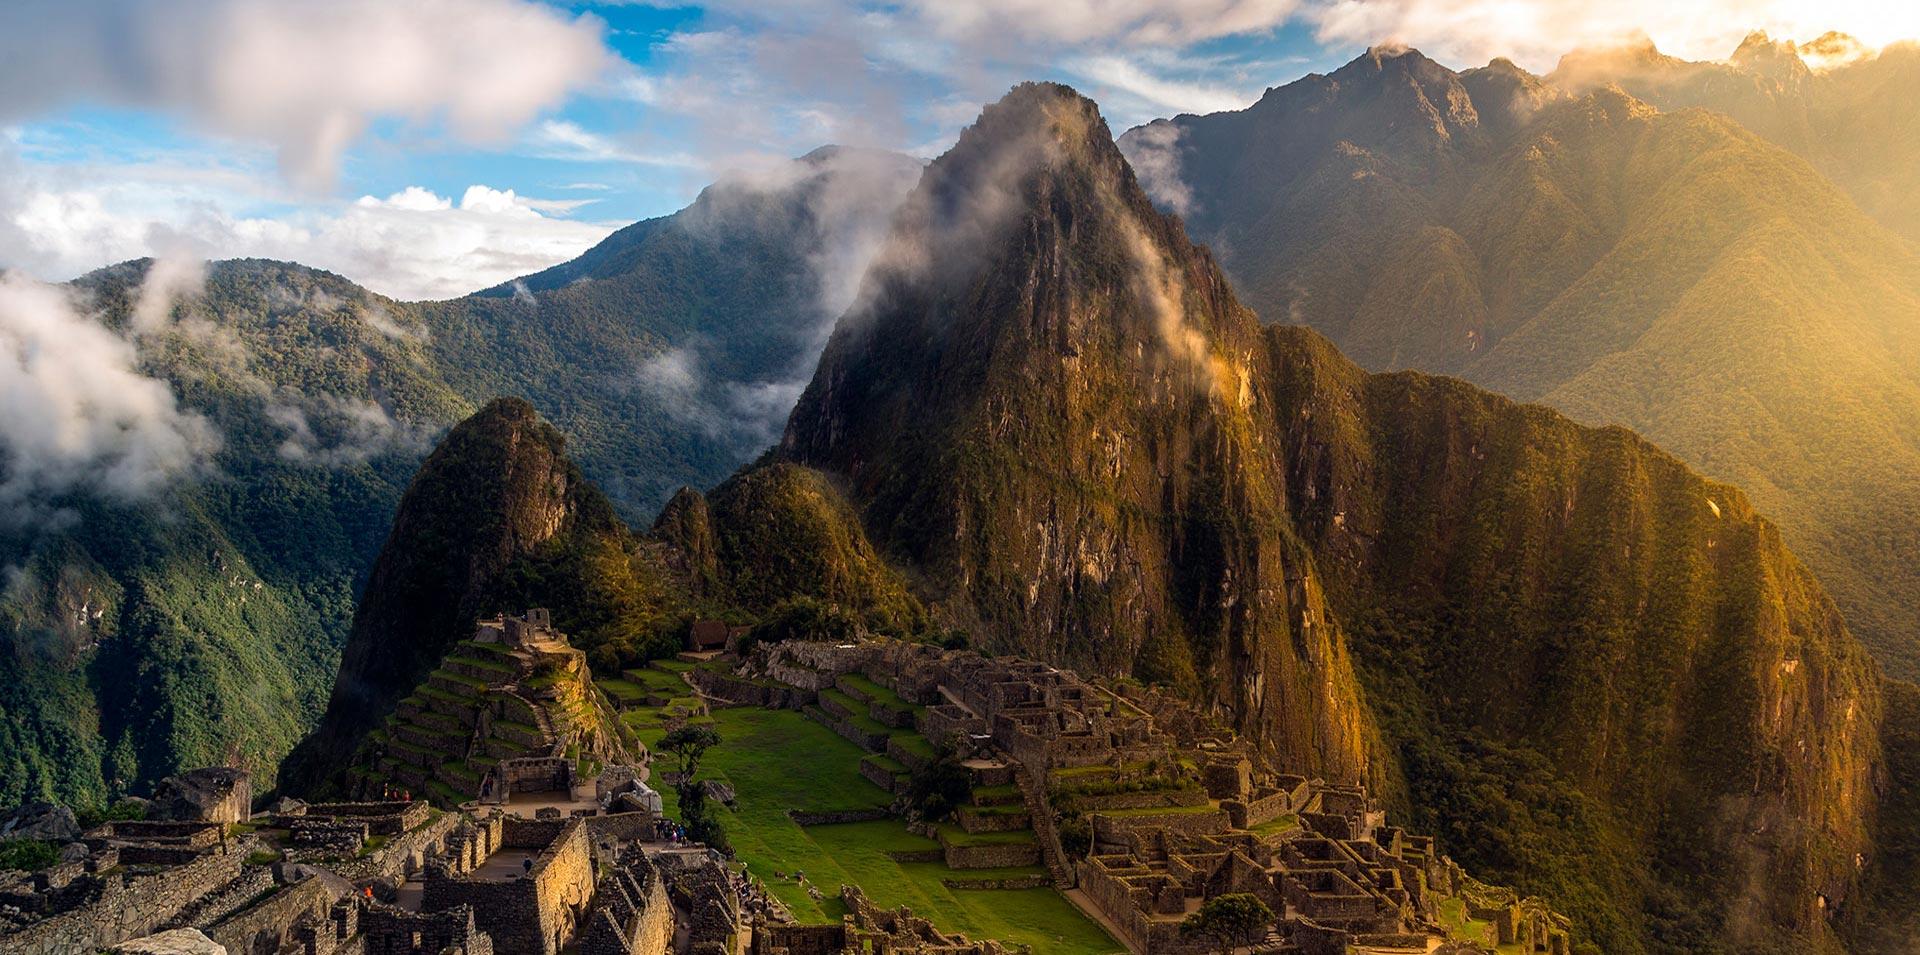 Paisaje en la mañana de Machu Picchu